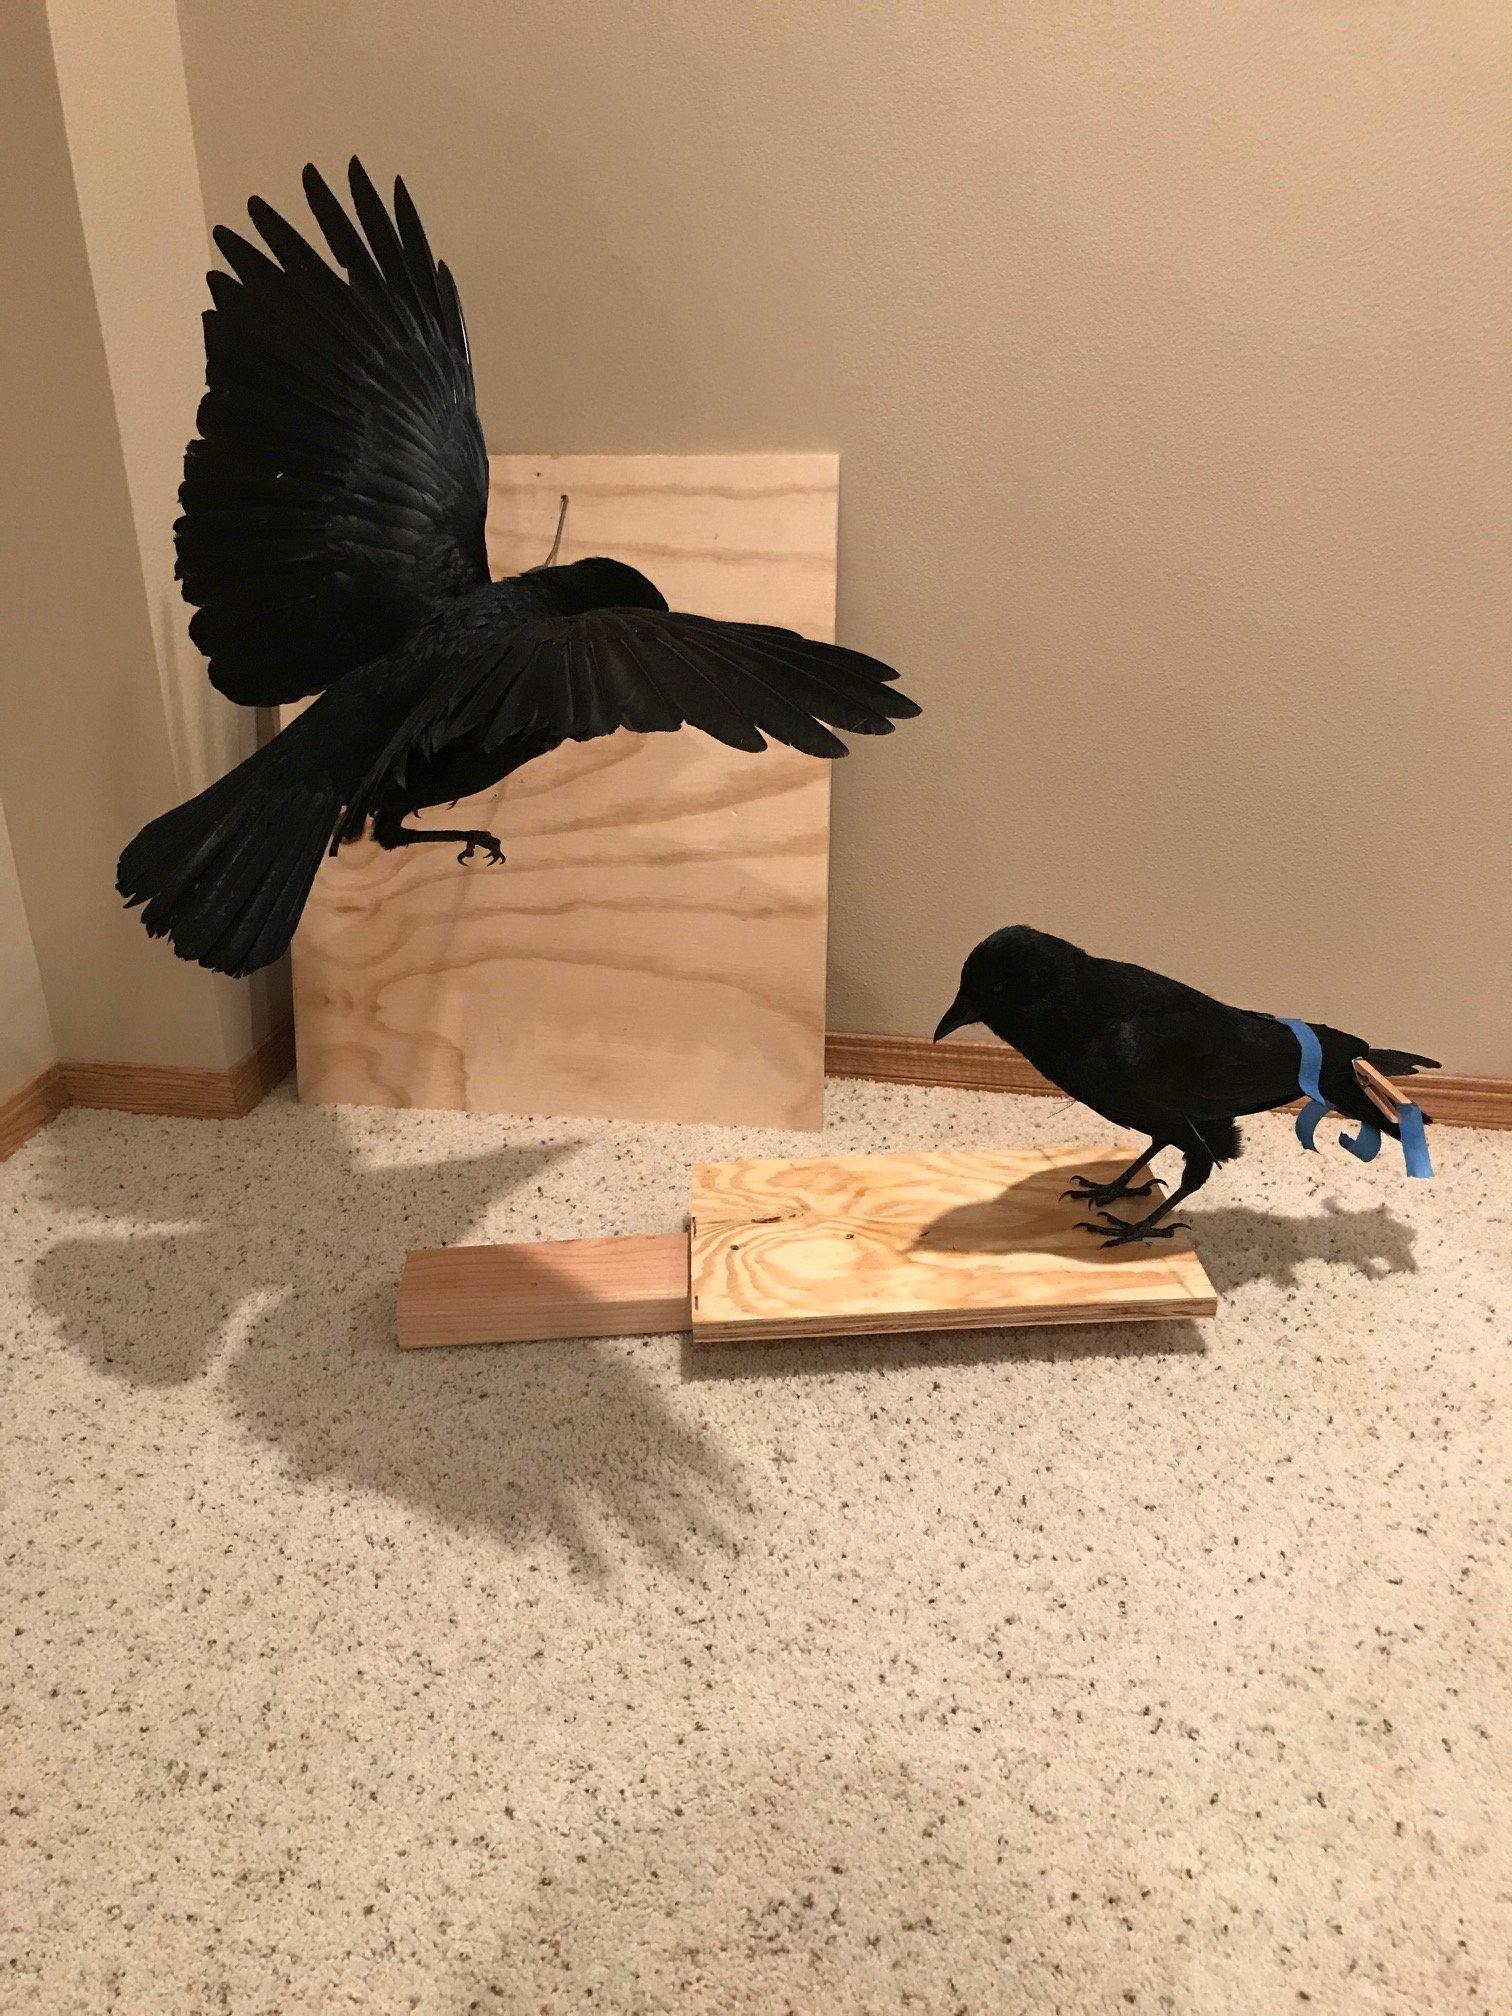 crows 11-18-2020.jpeg